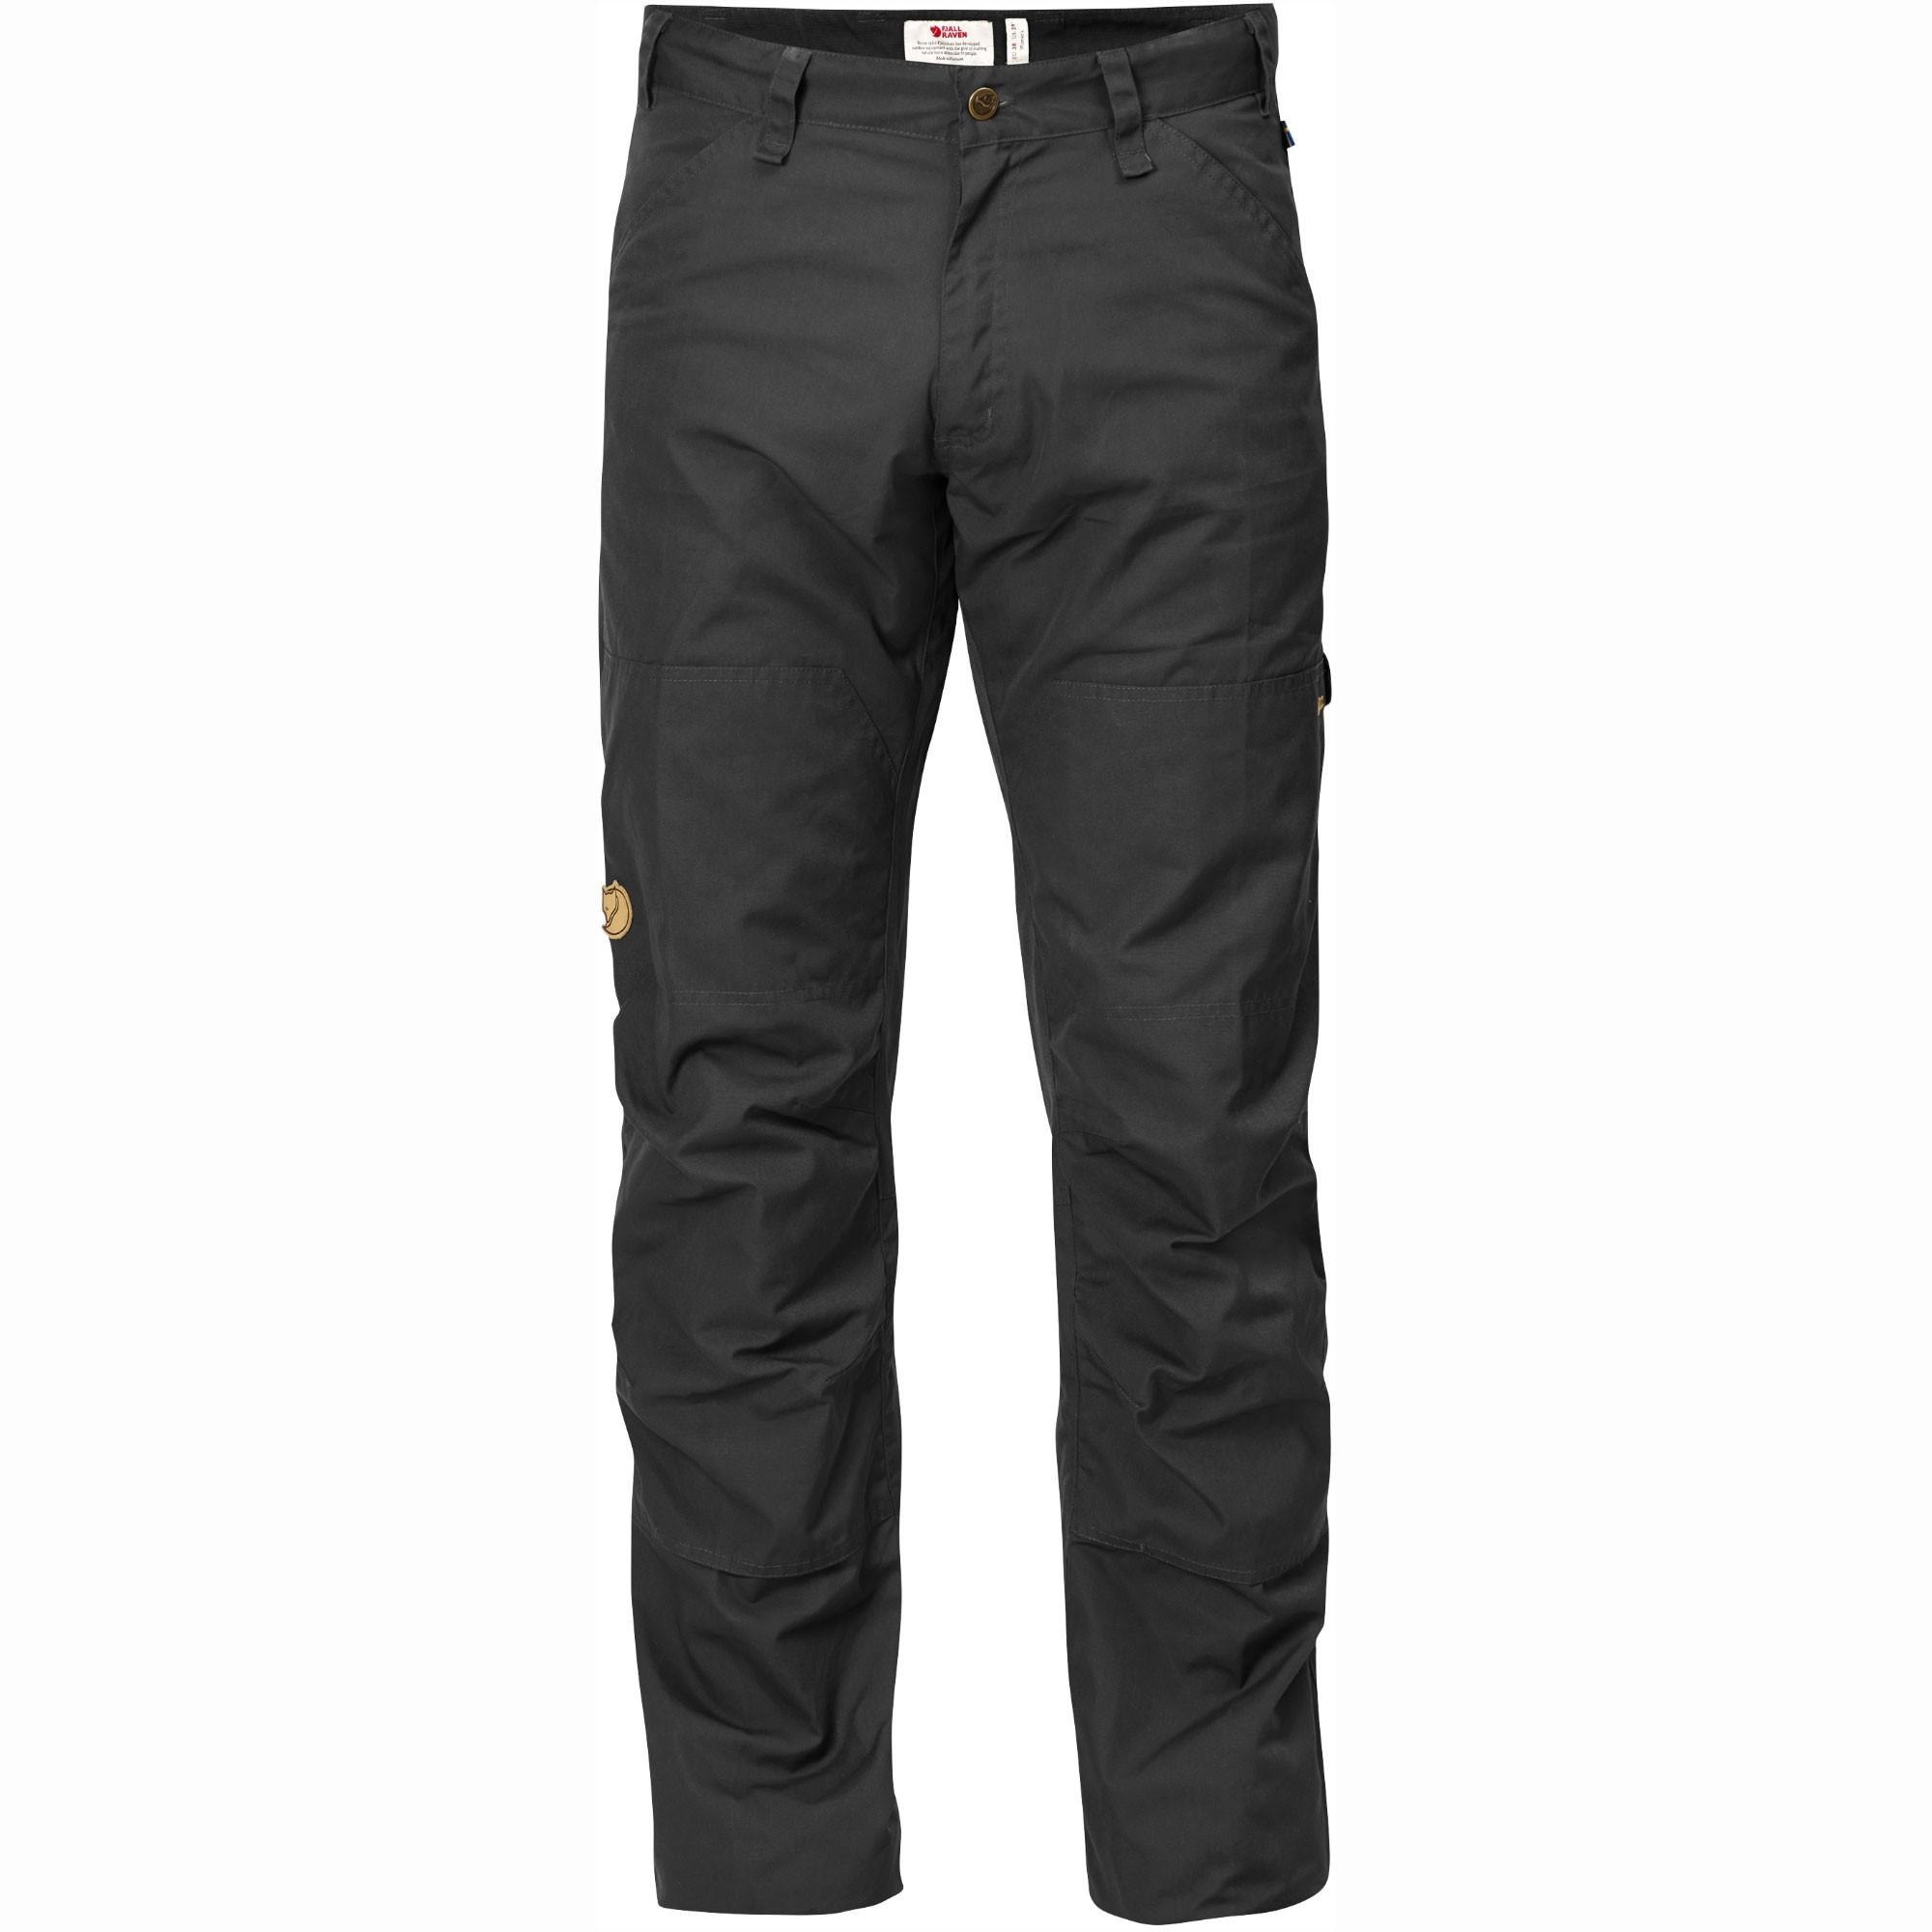 Fjallraven Barents Pro Men's Jeans 81461 - Dark Grey